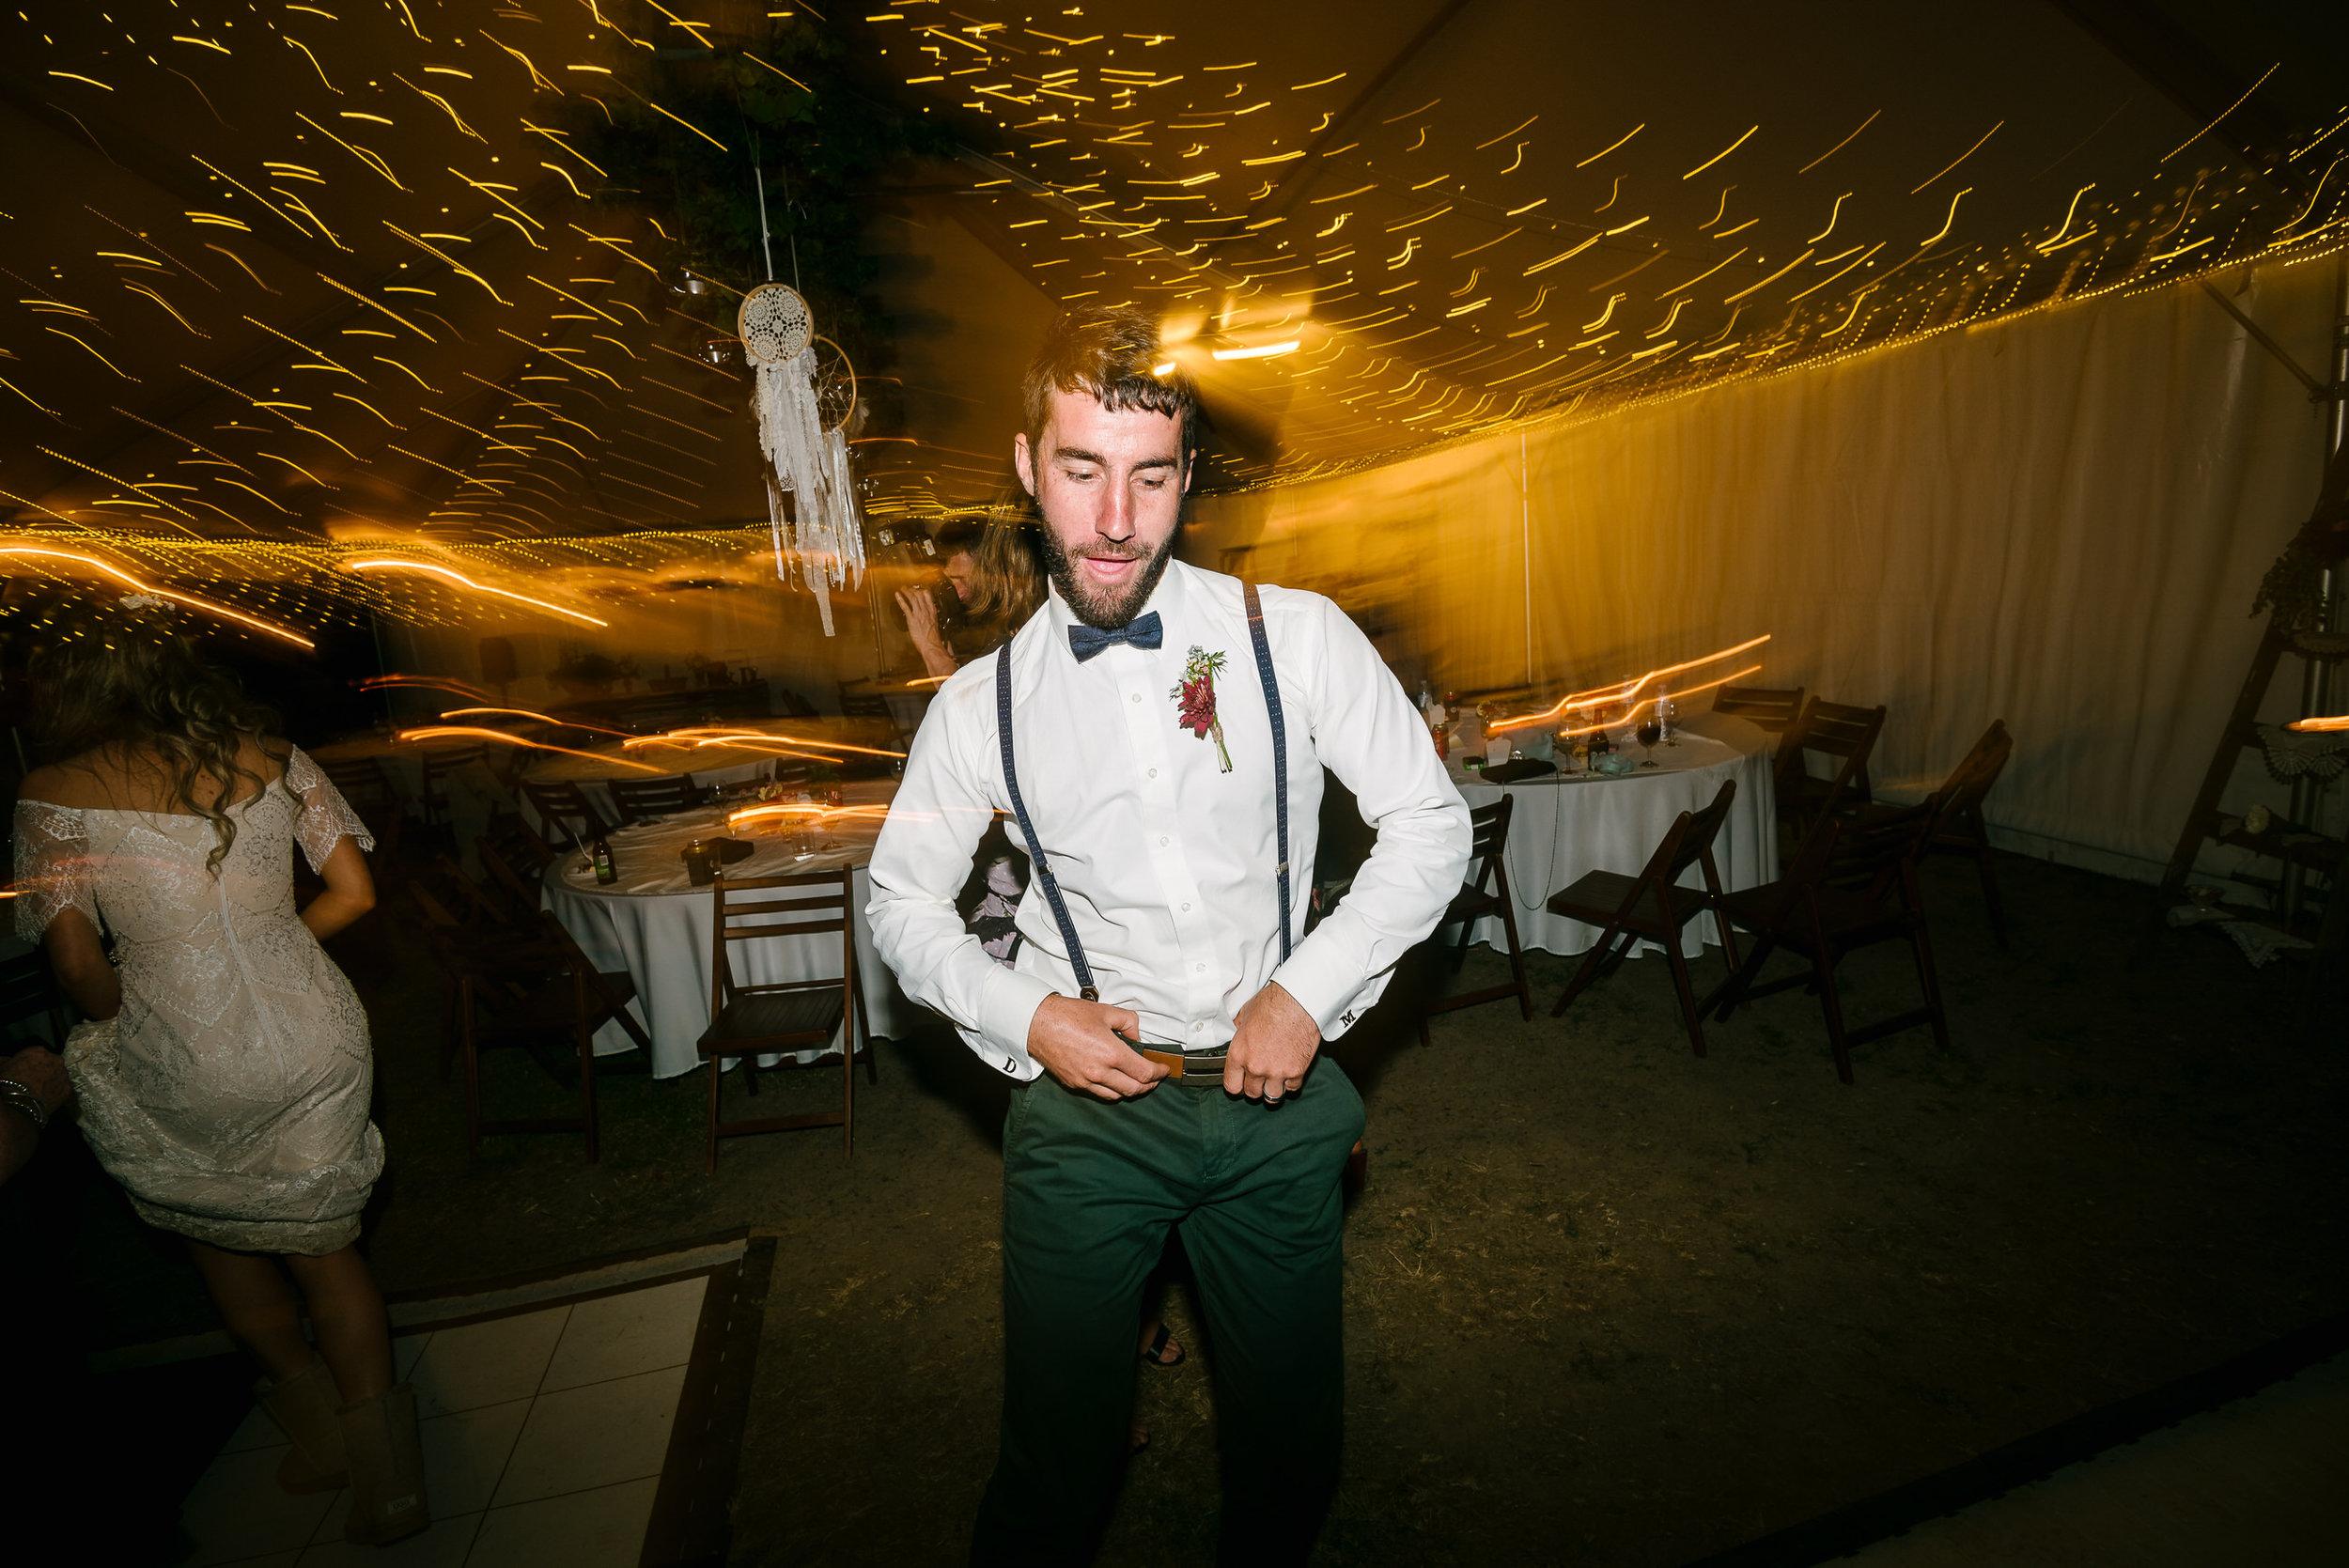 Justin_And_Jim_Photography_Backyard_Wedding243.JPG